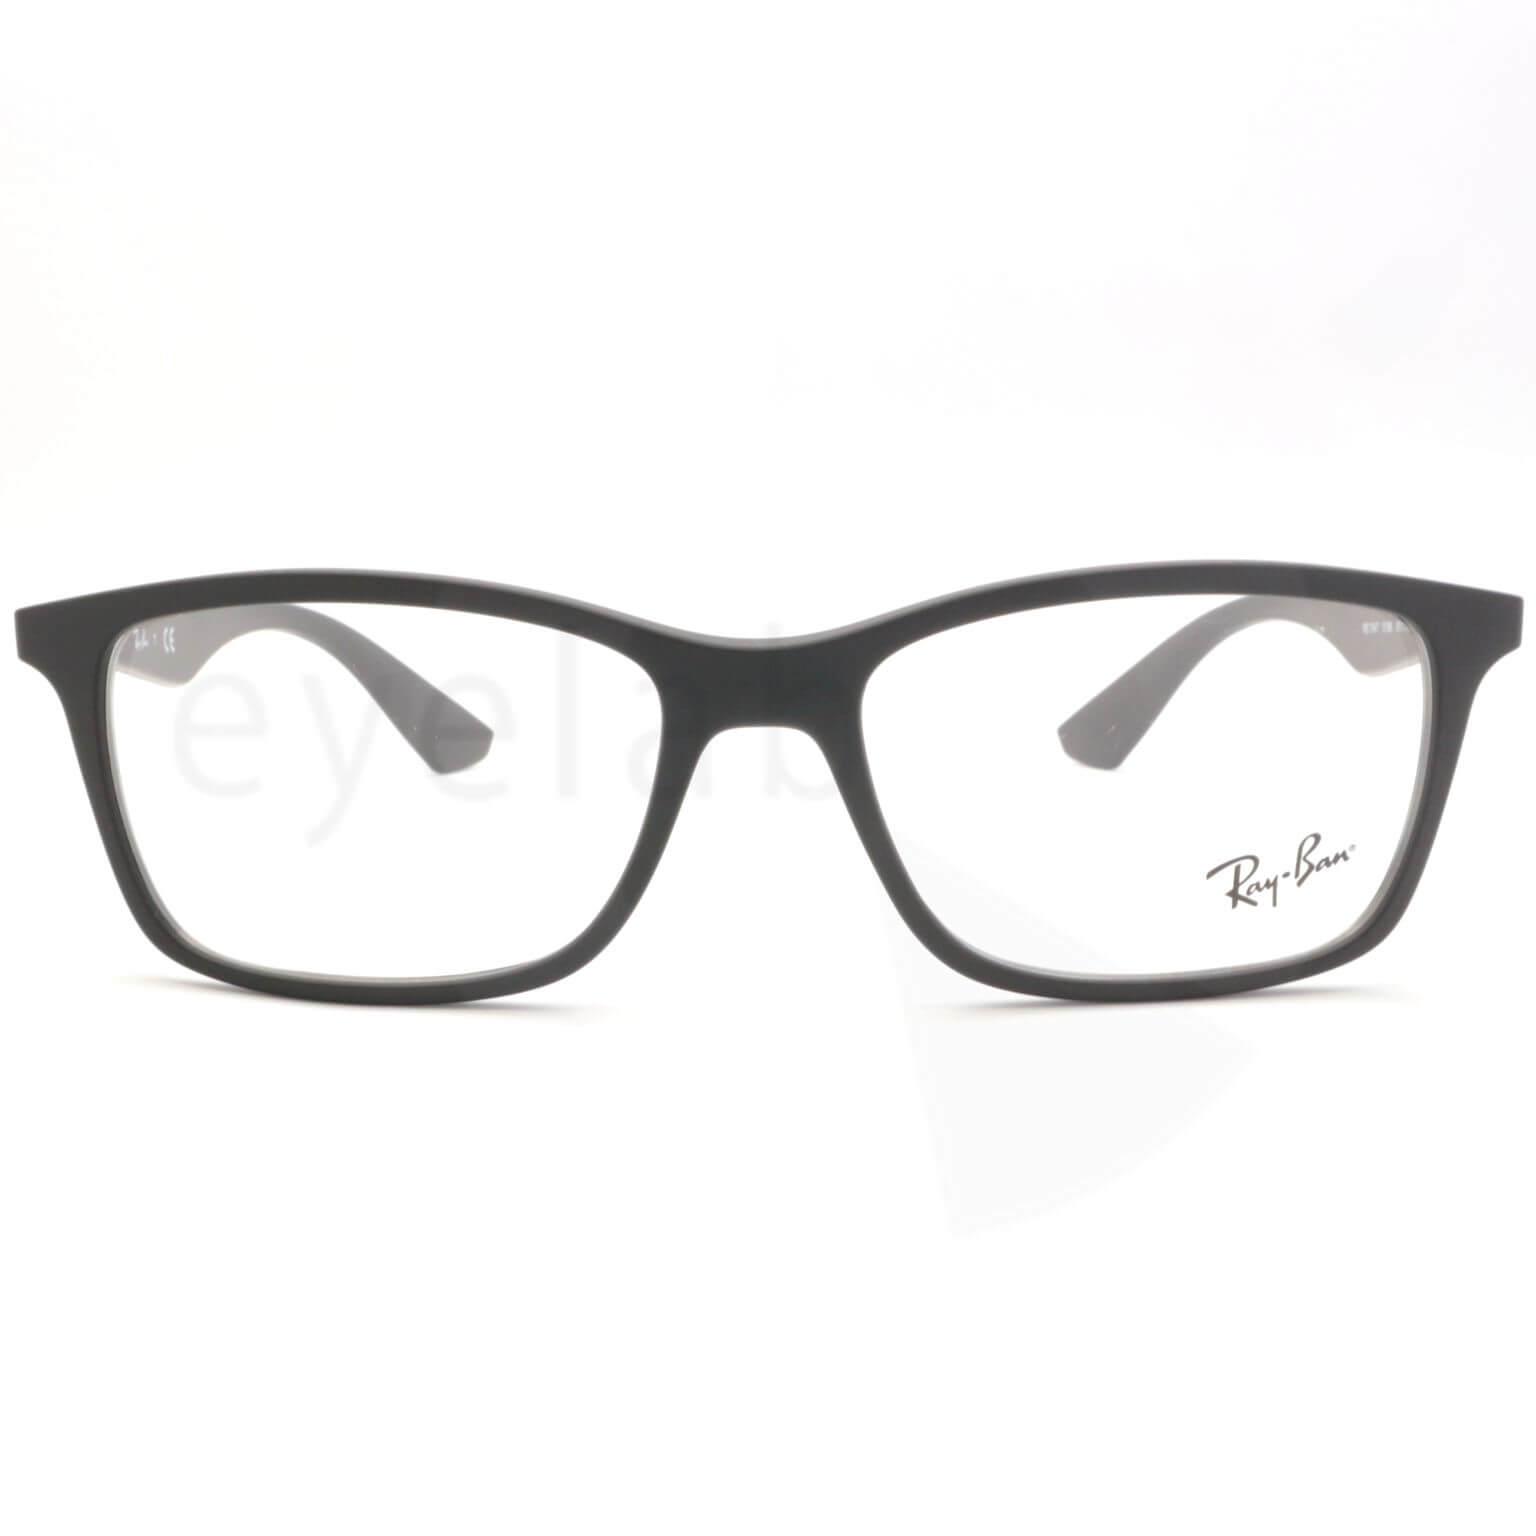 Ray-Ban 7047 5196 56 ~ Eyelab 885d1e9923b